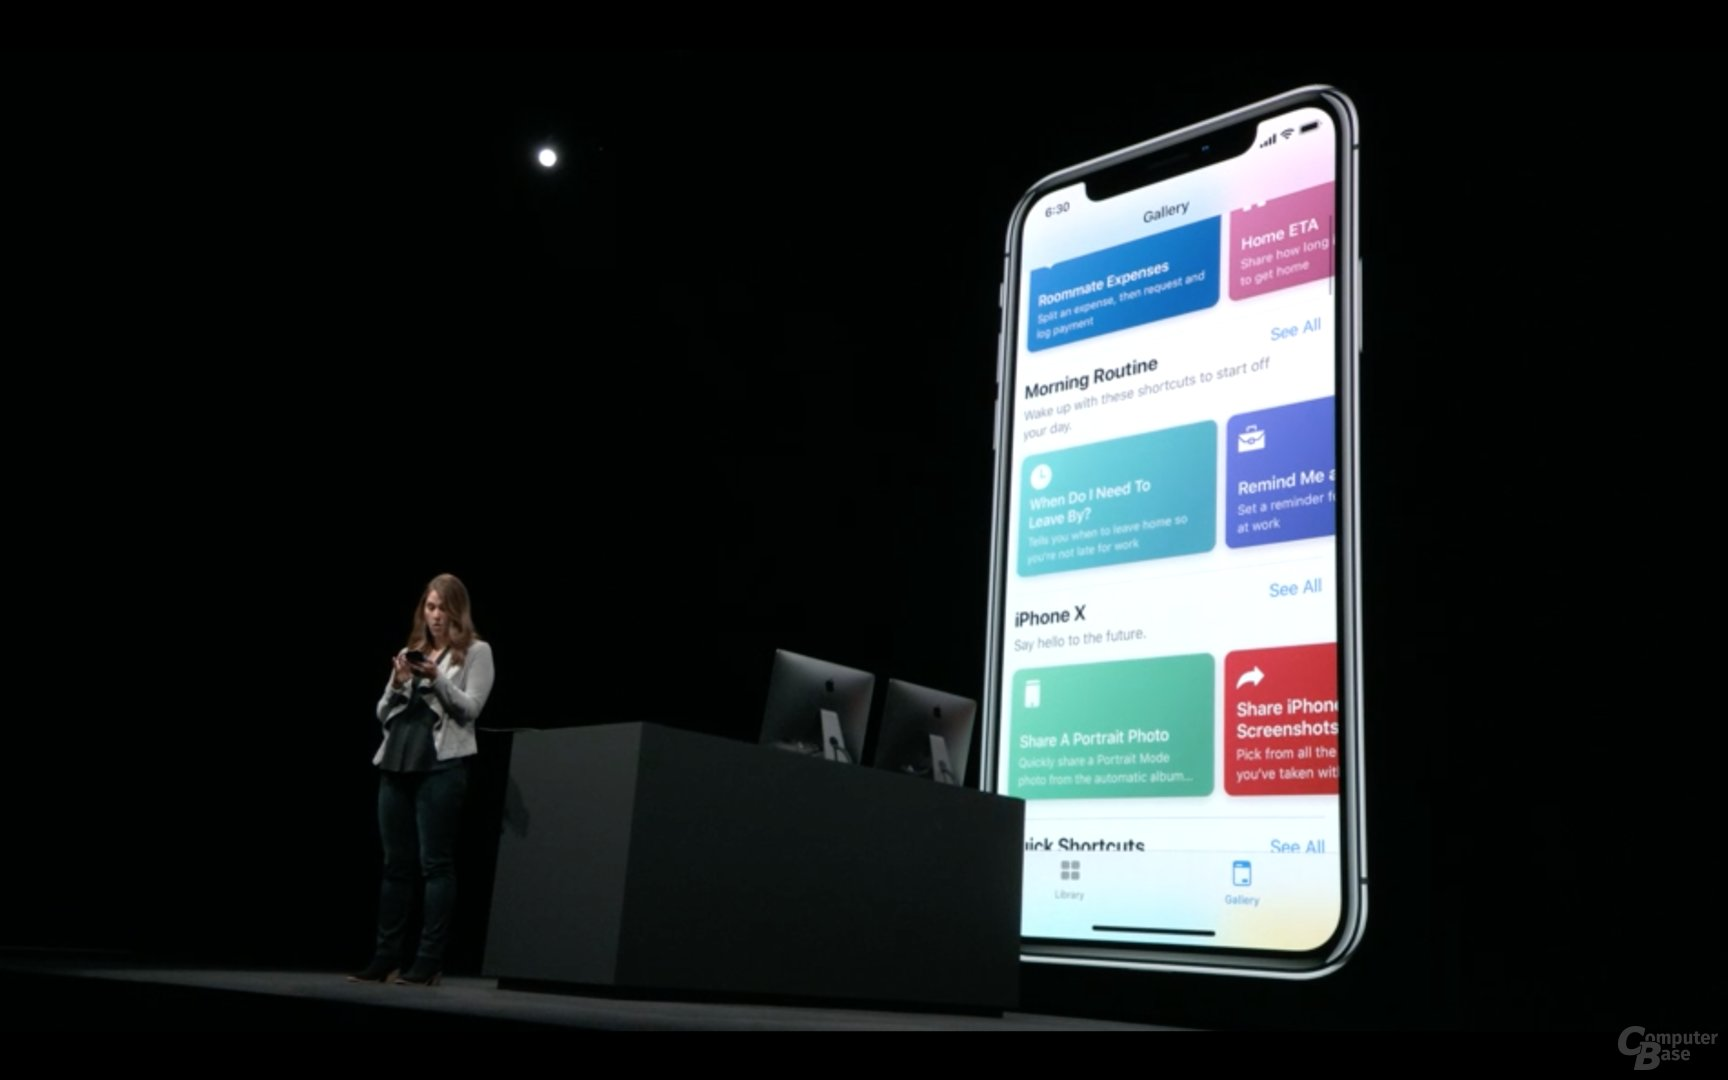 Siri Shortcuts per Shortcuts-App in Serie schalten